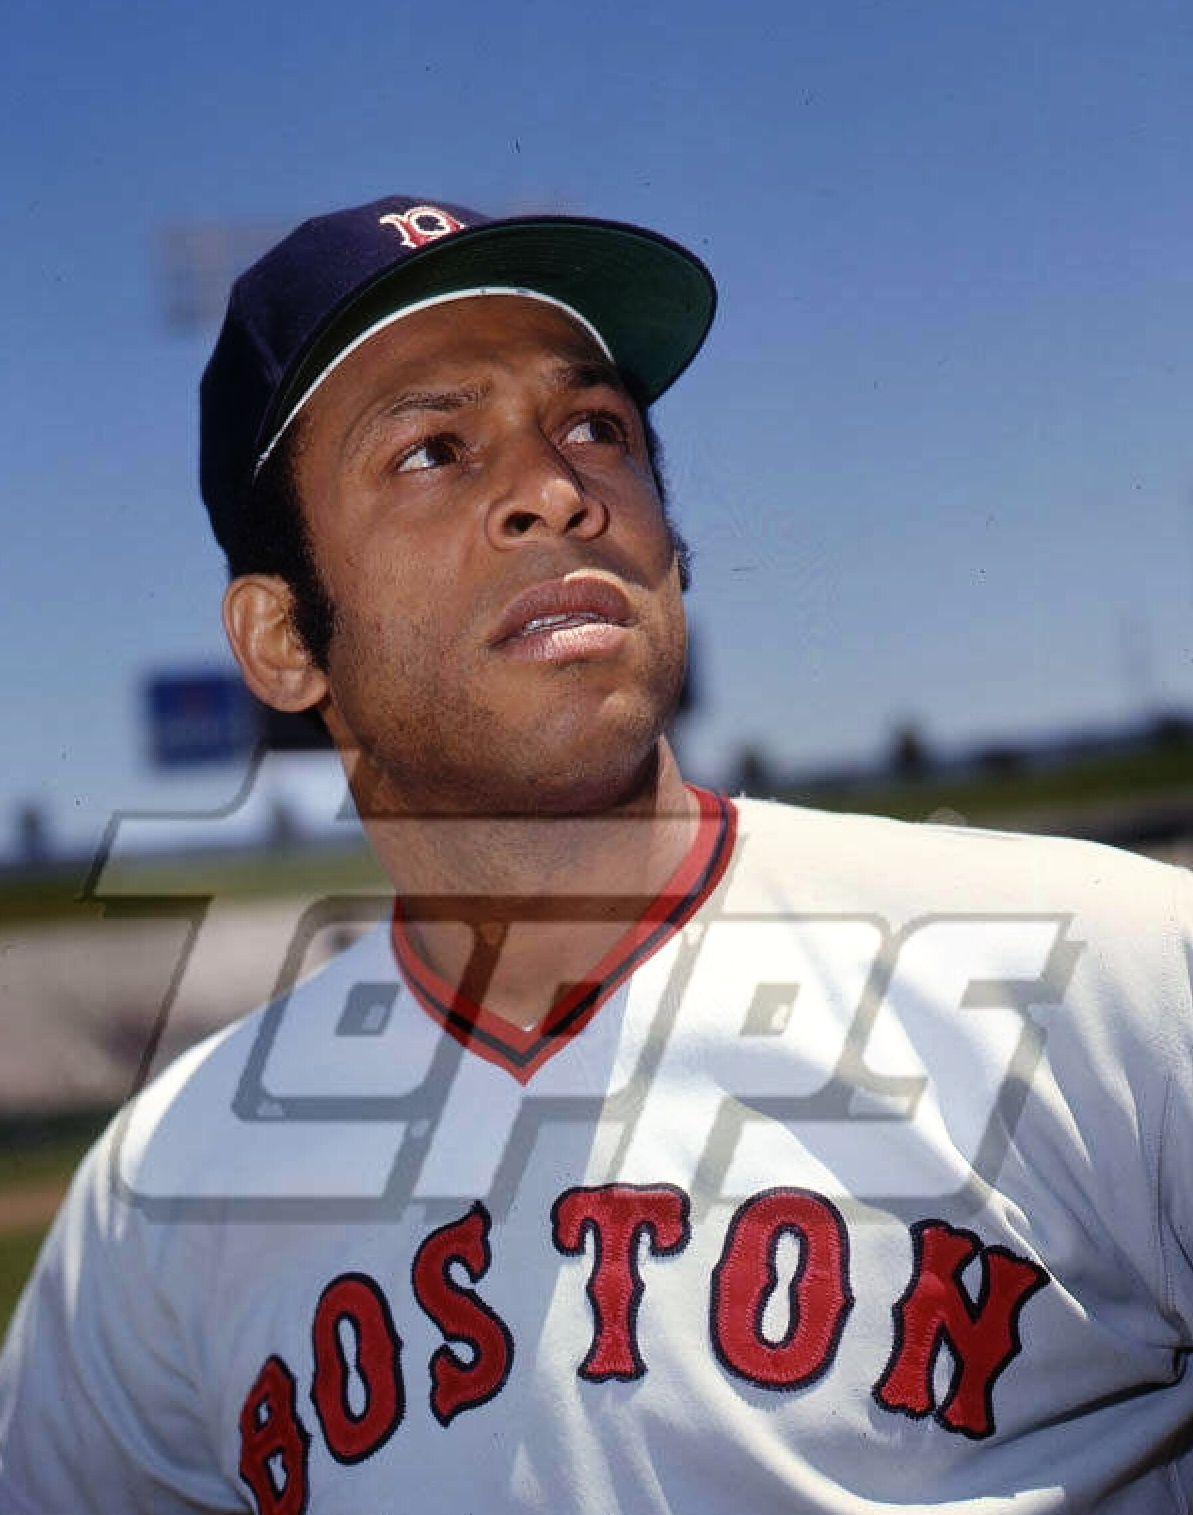 Orlando Cepeda | Baseball star